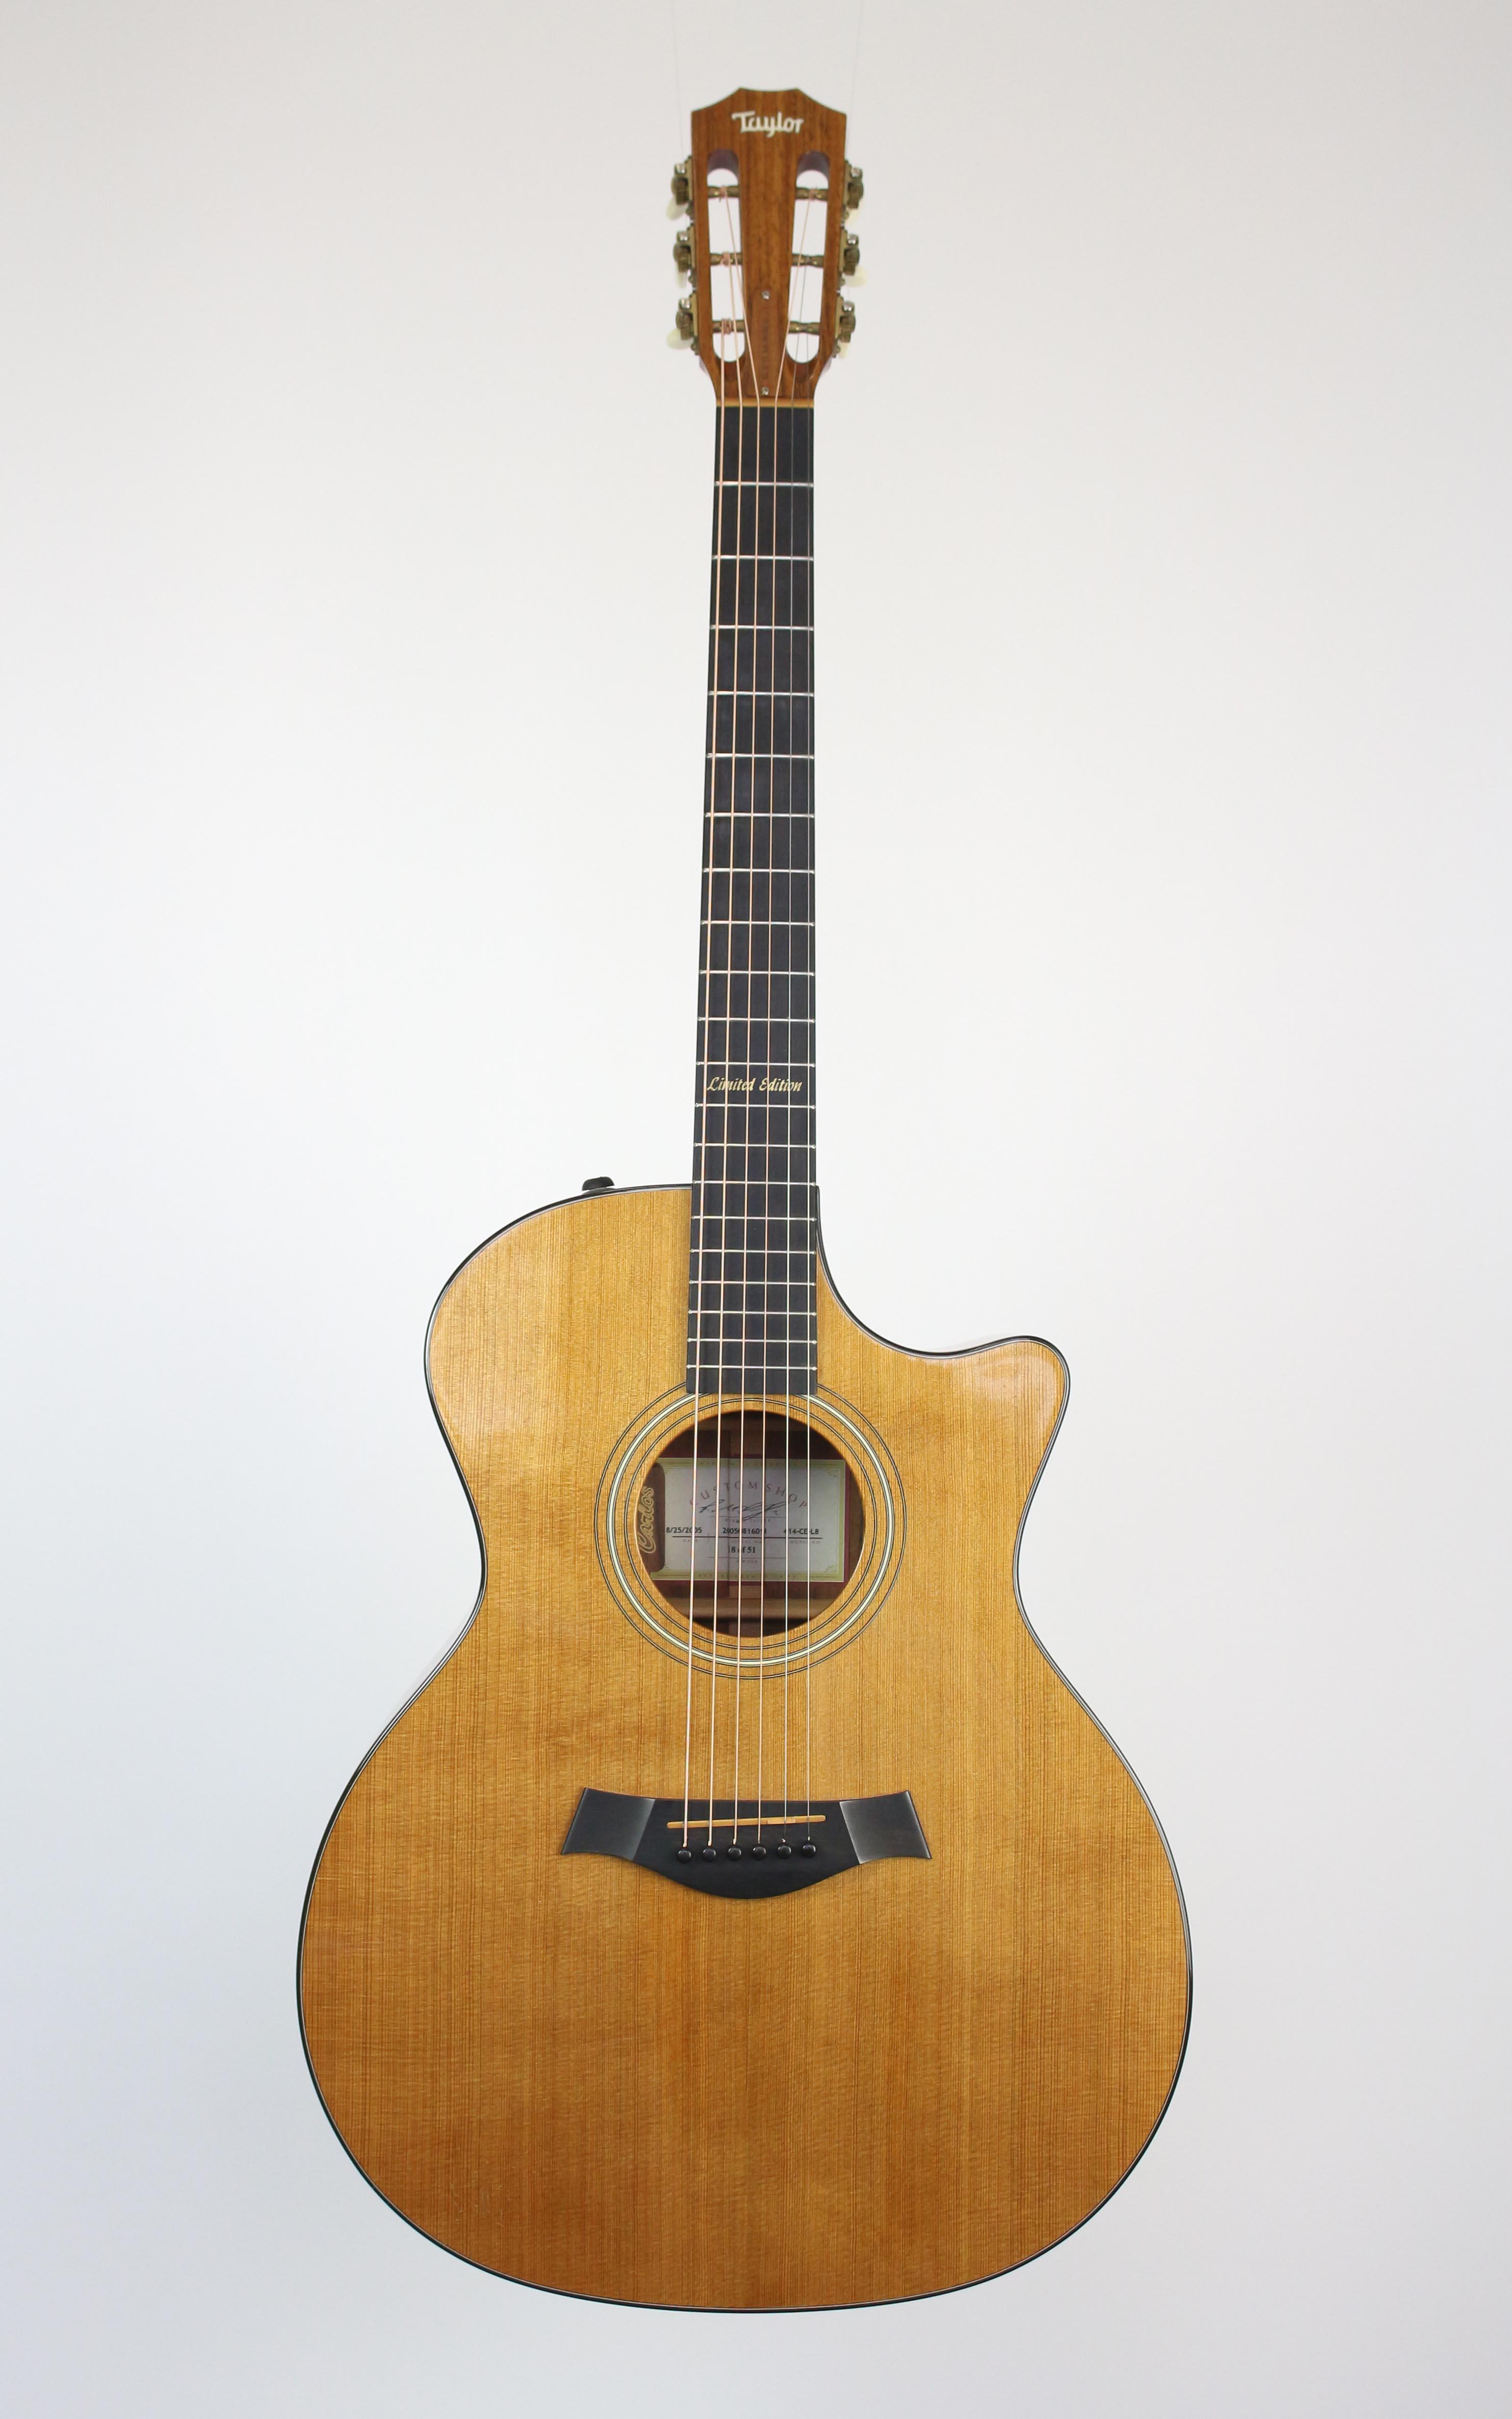 Taylor - 414ce LTD L-8 Carlos Pickup High End - Gitarren - Westerngitarren | MUSIK BERTRAM Deutschland Freiburg